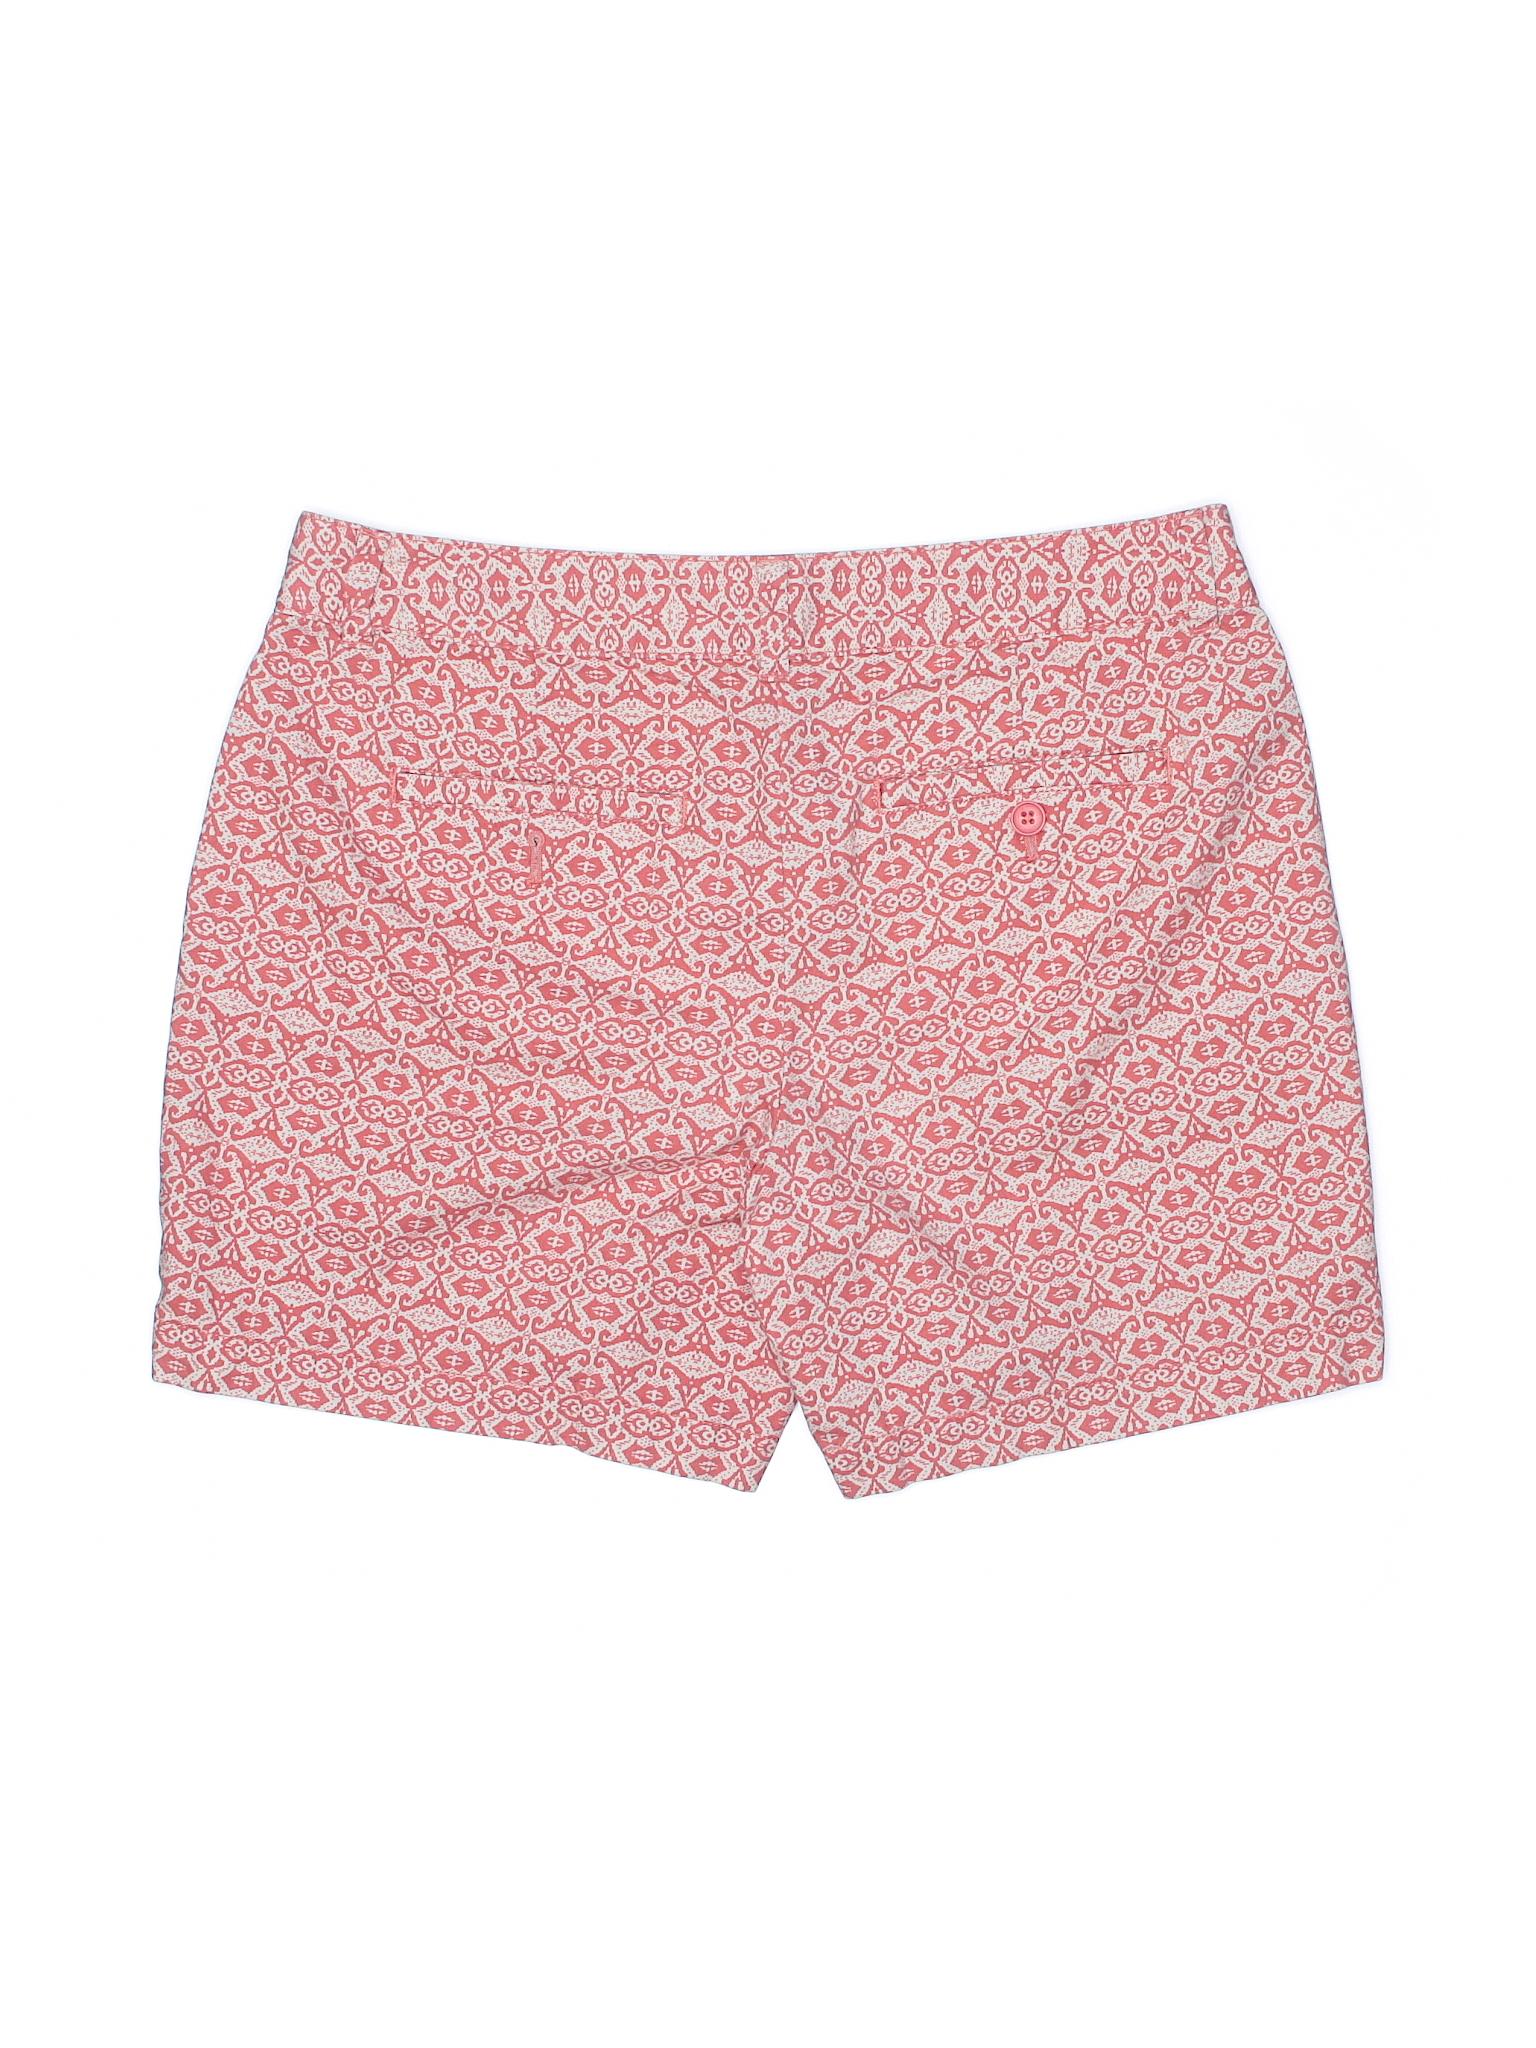 Taylor LOFT Boutique Shorts Ann Khaki vp55qx6w